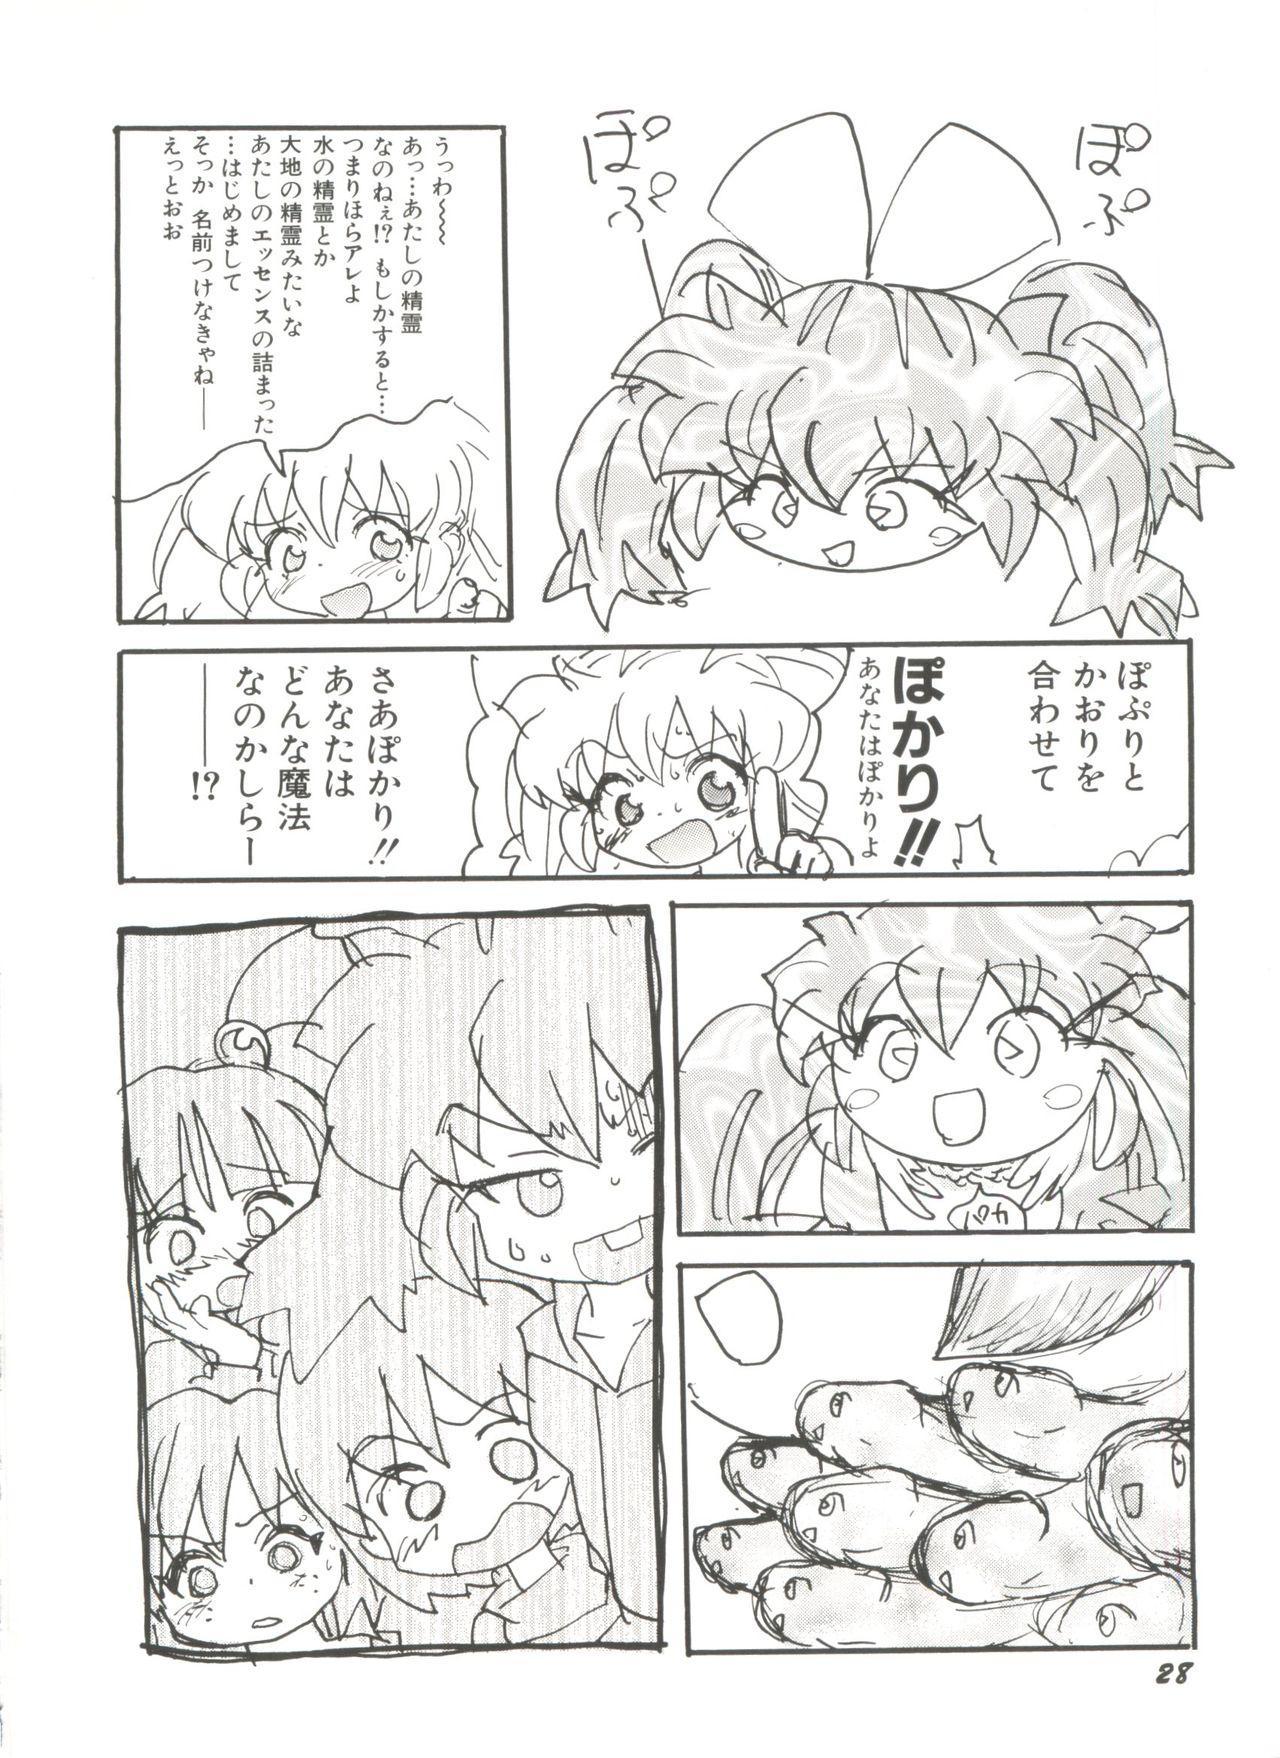 [Anthology] Denei Tamatebako 8 - Utakata no Tenshi-tachi II (Various) 29